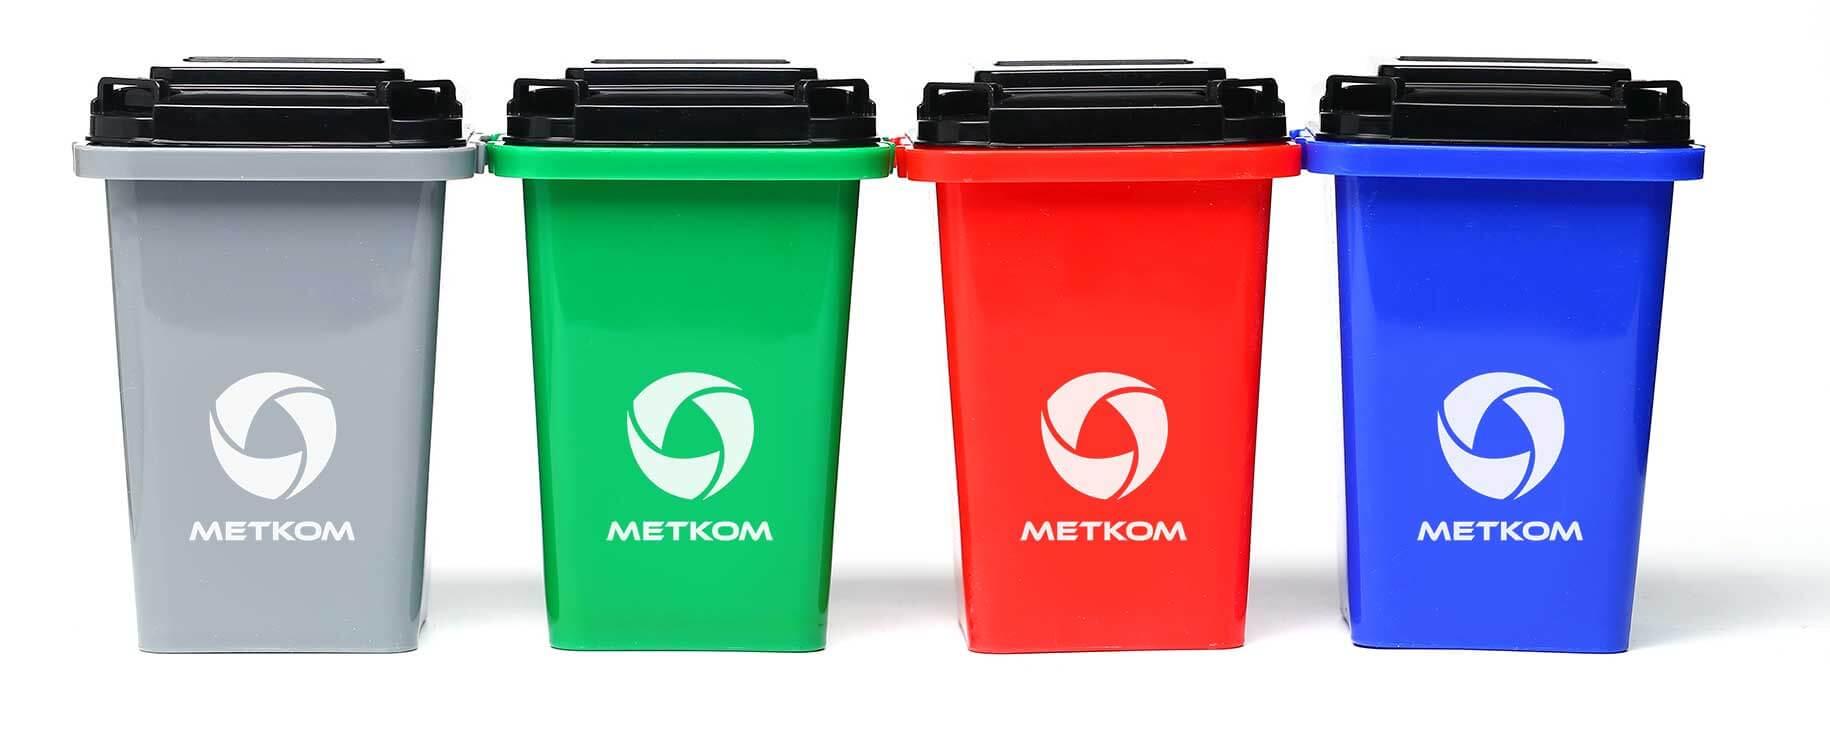 pojemnikimetkomsml - Comprehensive Waste Management